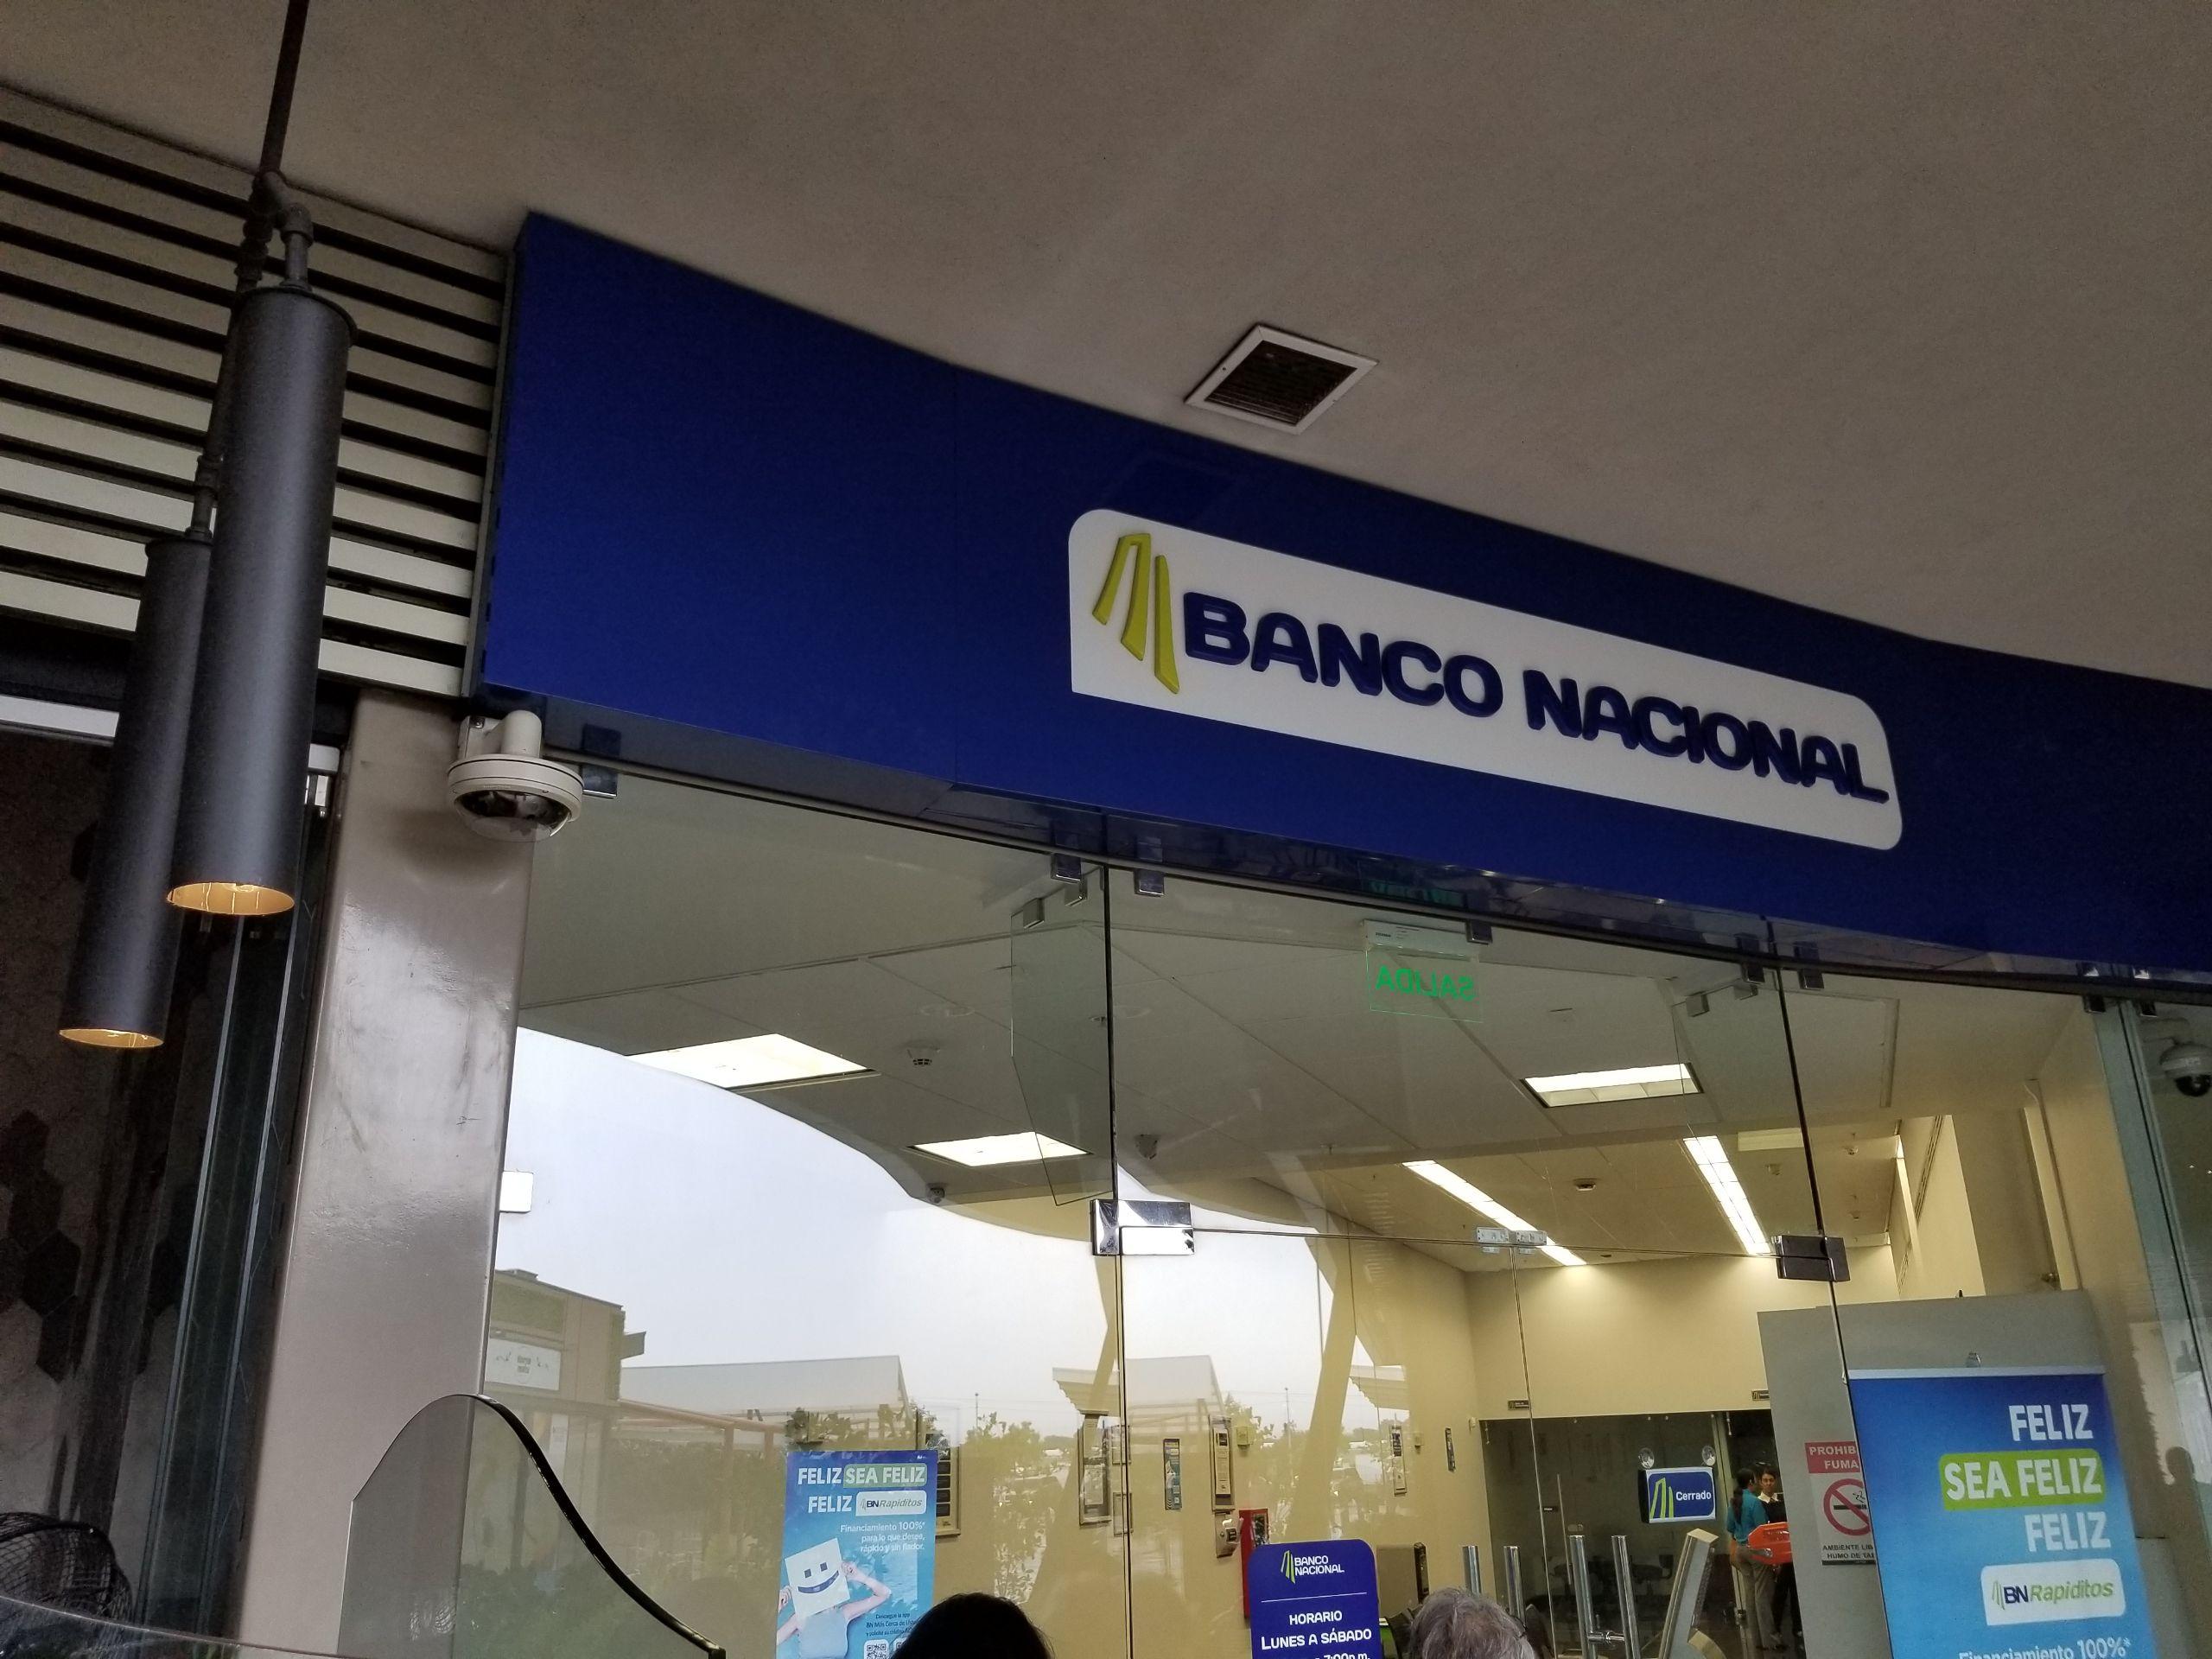 Banco Nacional, Escazu, Costa Rica